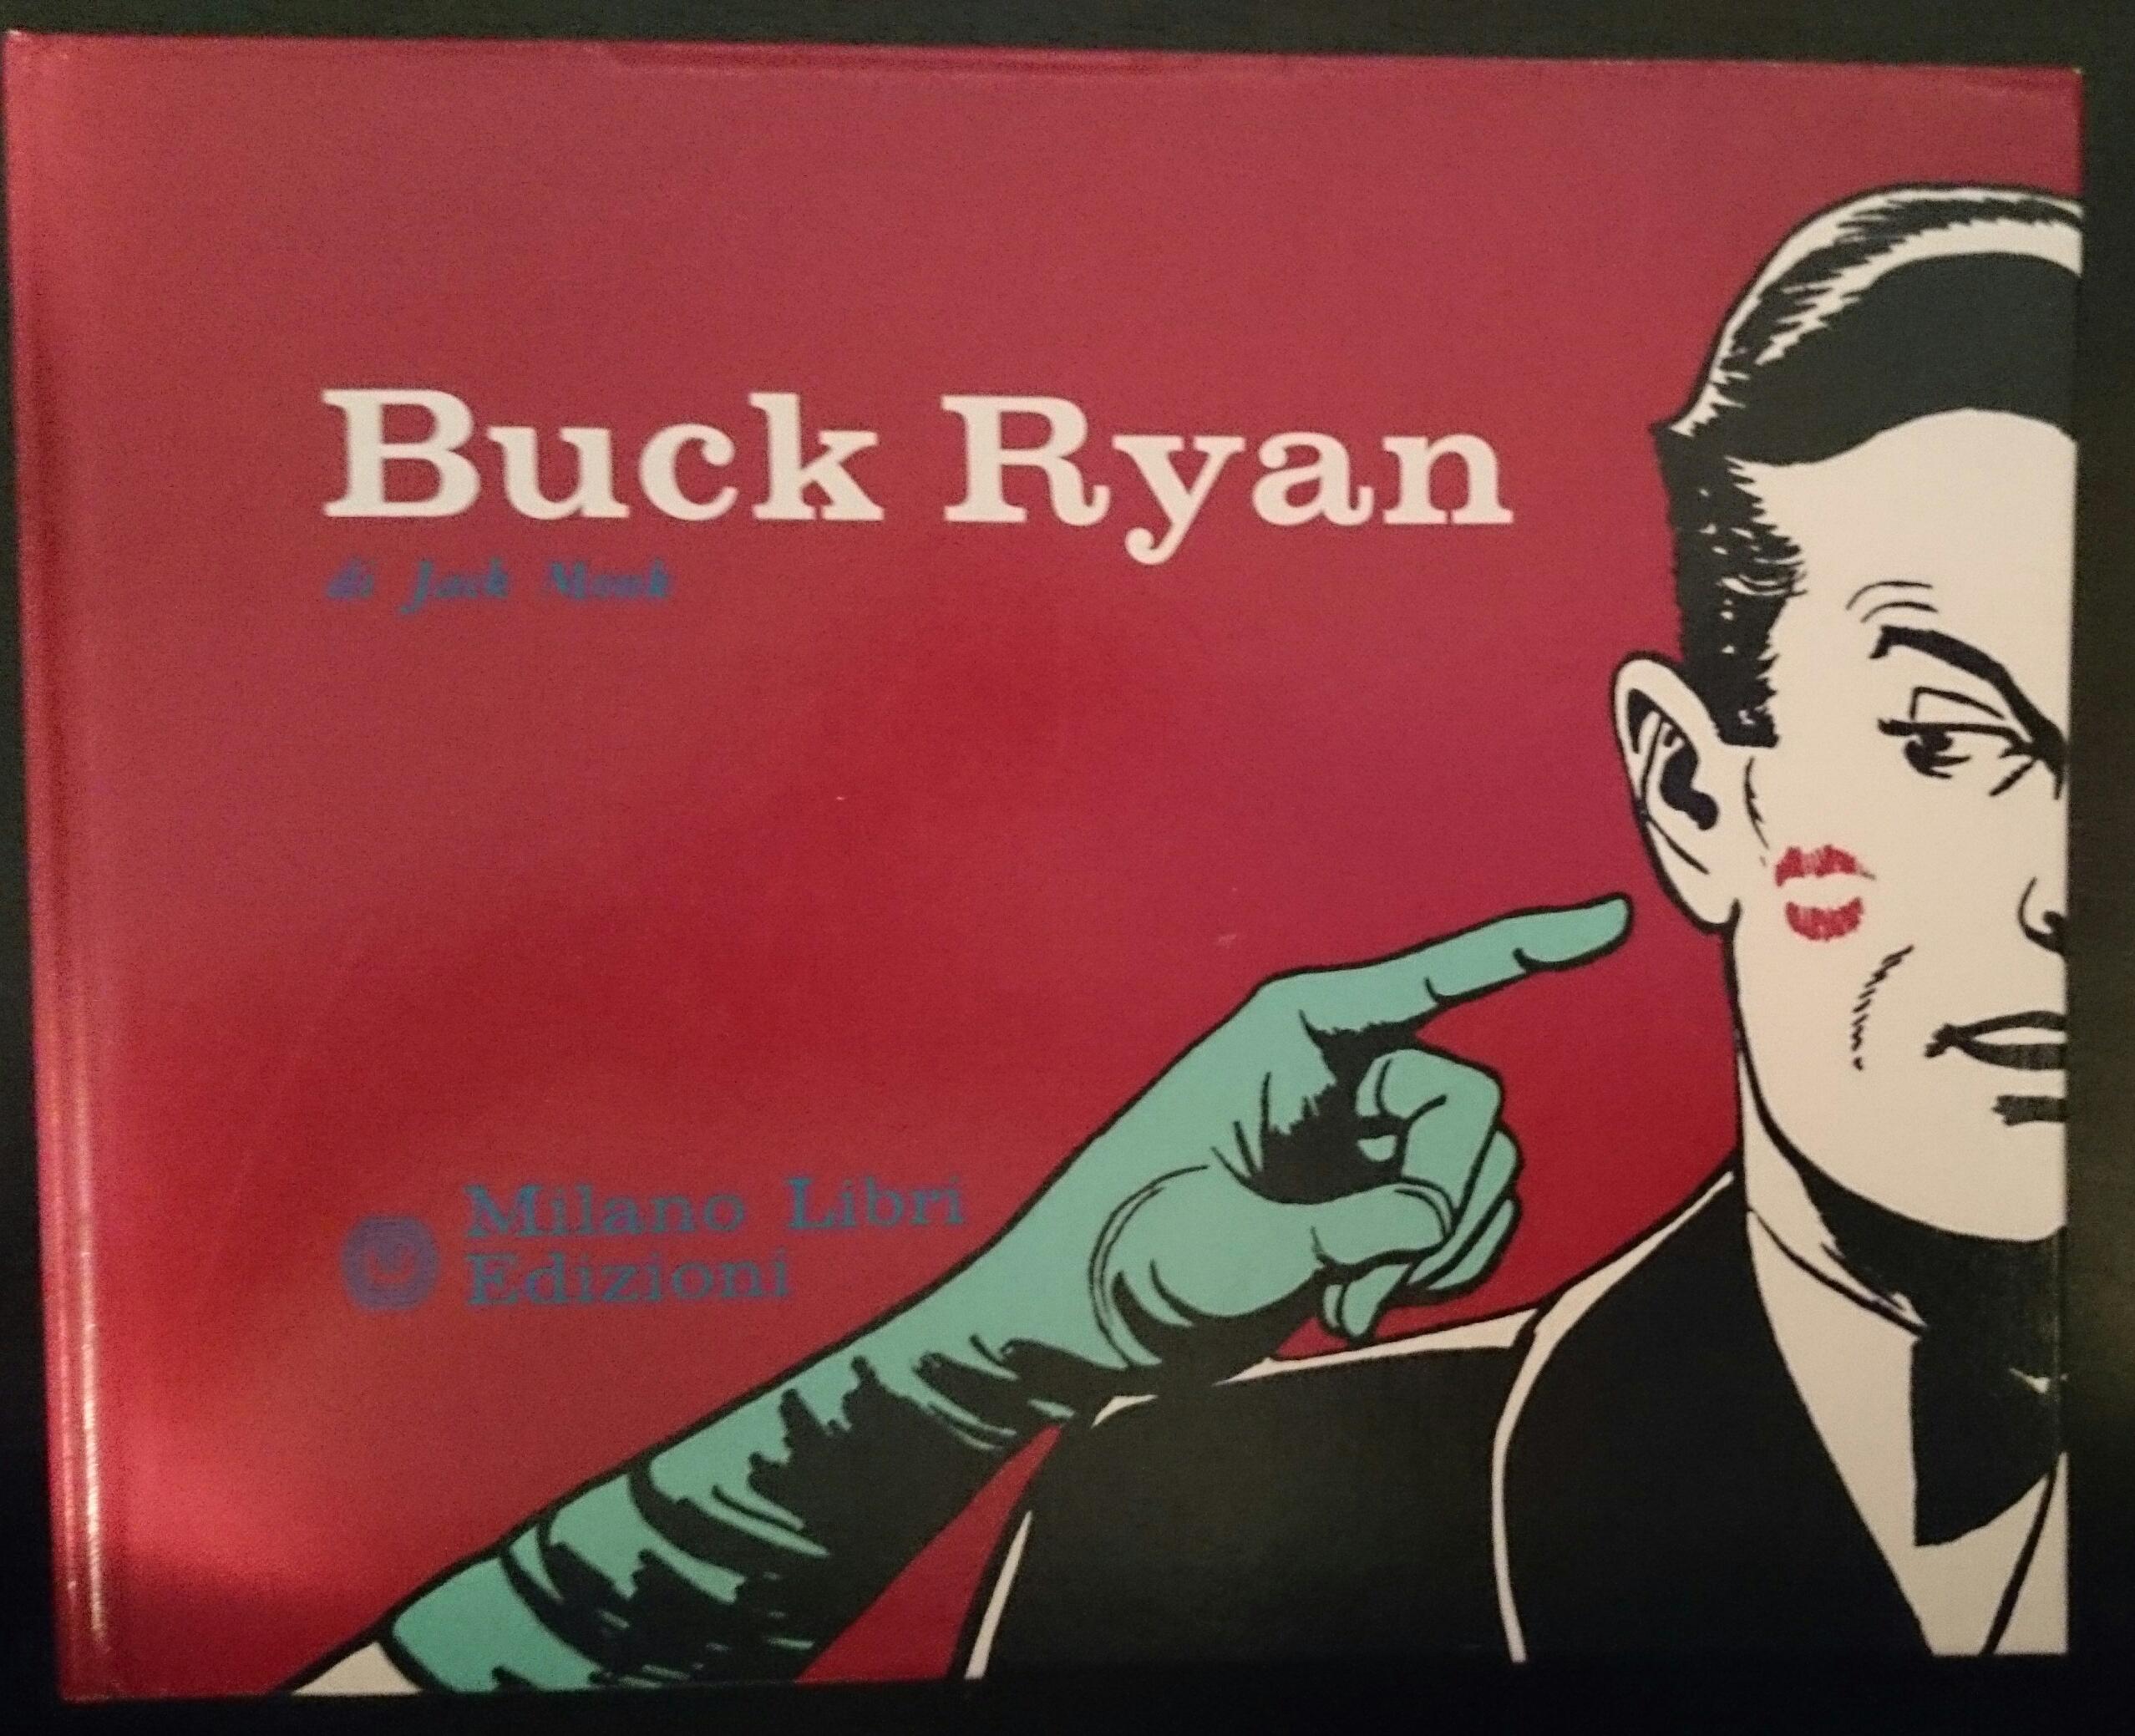 Buck Ryan